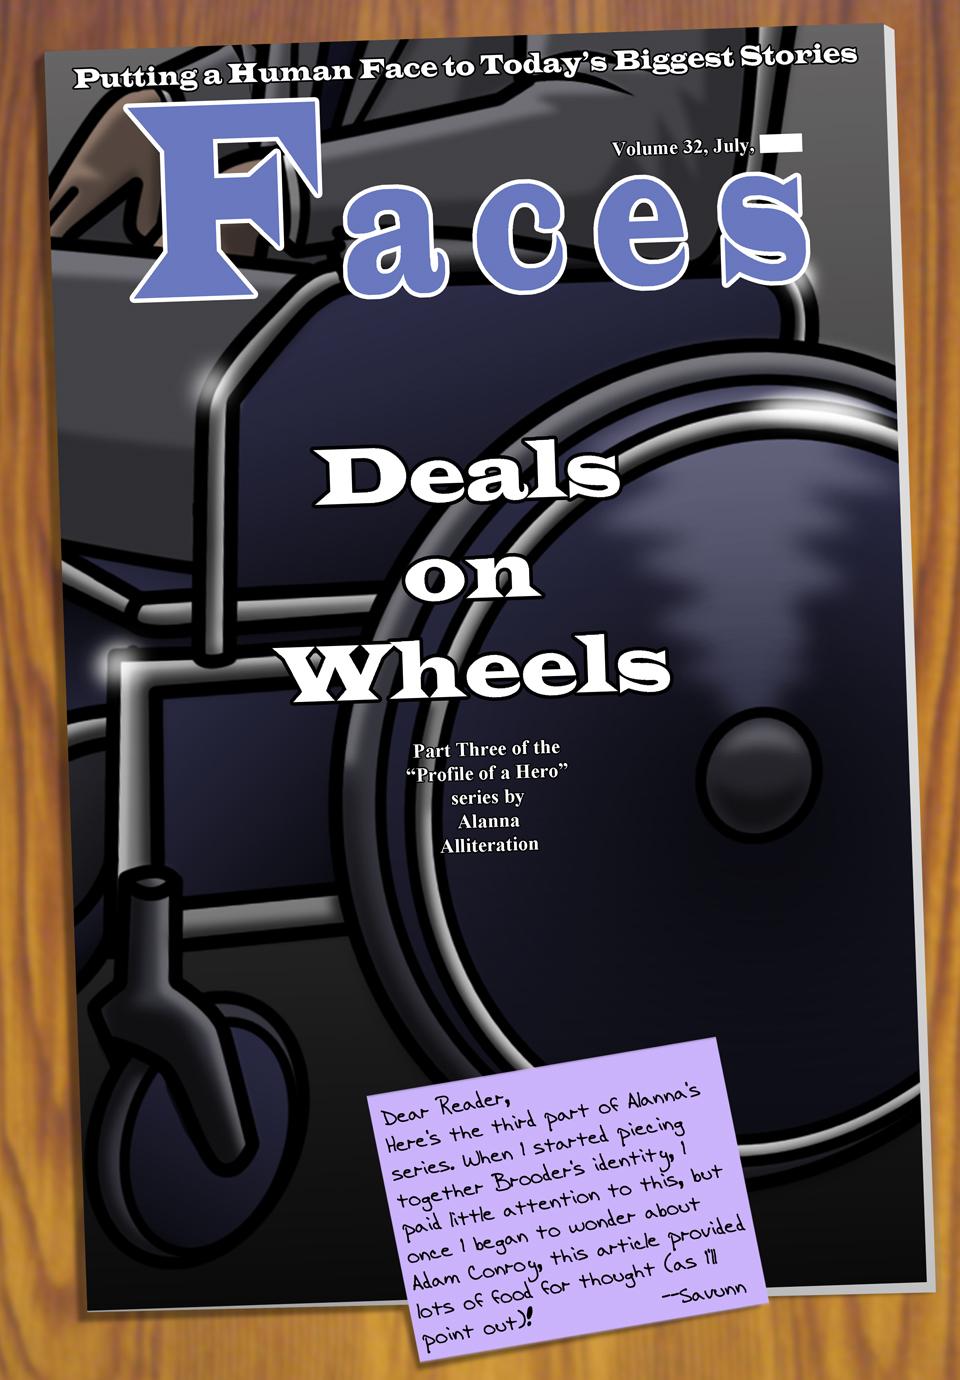 Interleude--Faces Magazine Interview 3 Cover